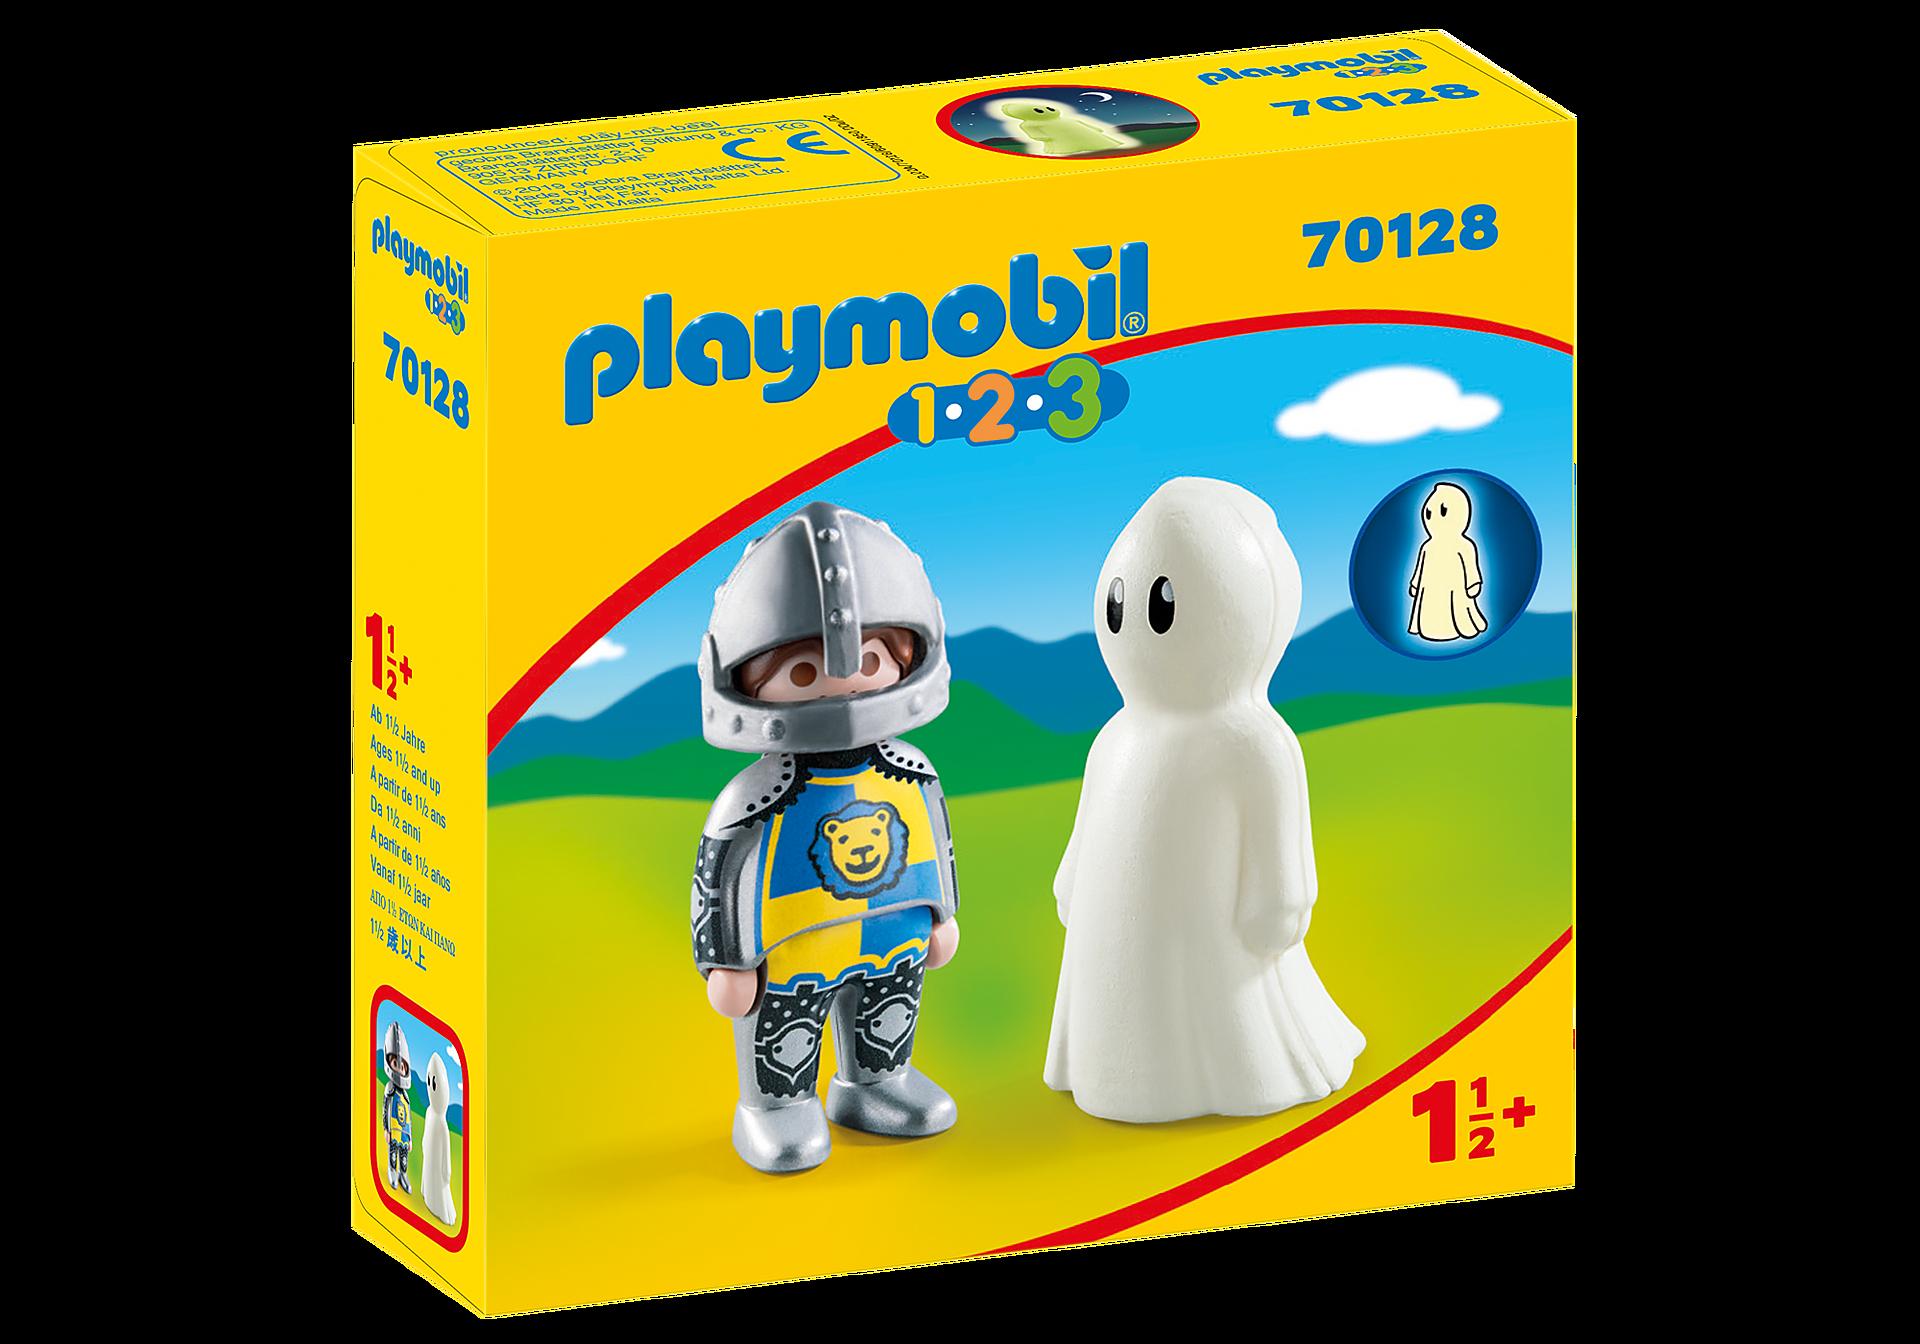 70128 1.2.3 Caballero con Fantasma zoom image2